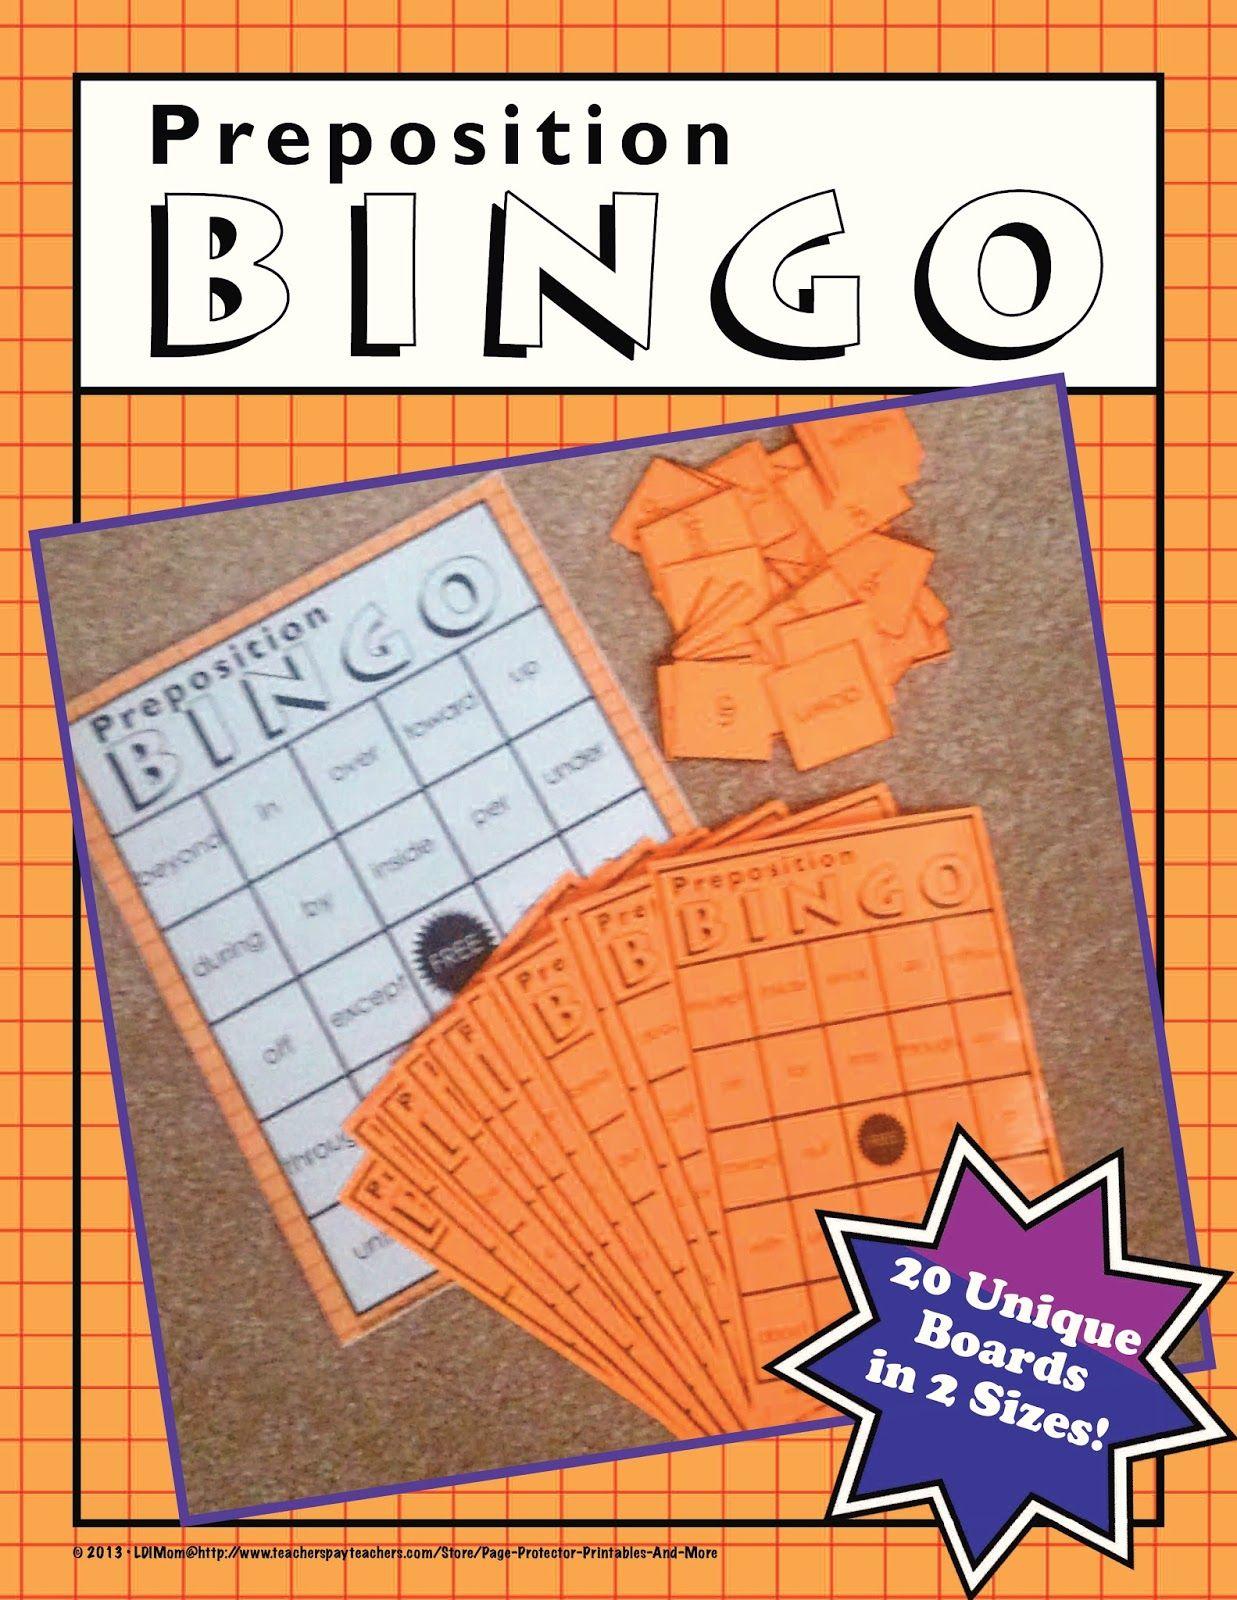 Fern S Freebie Friday Free Preposition Bingo